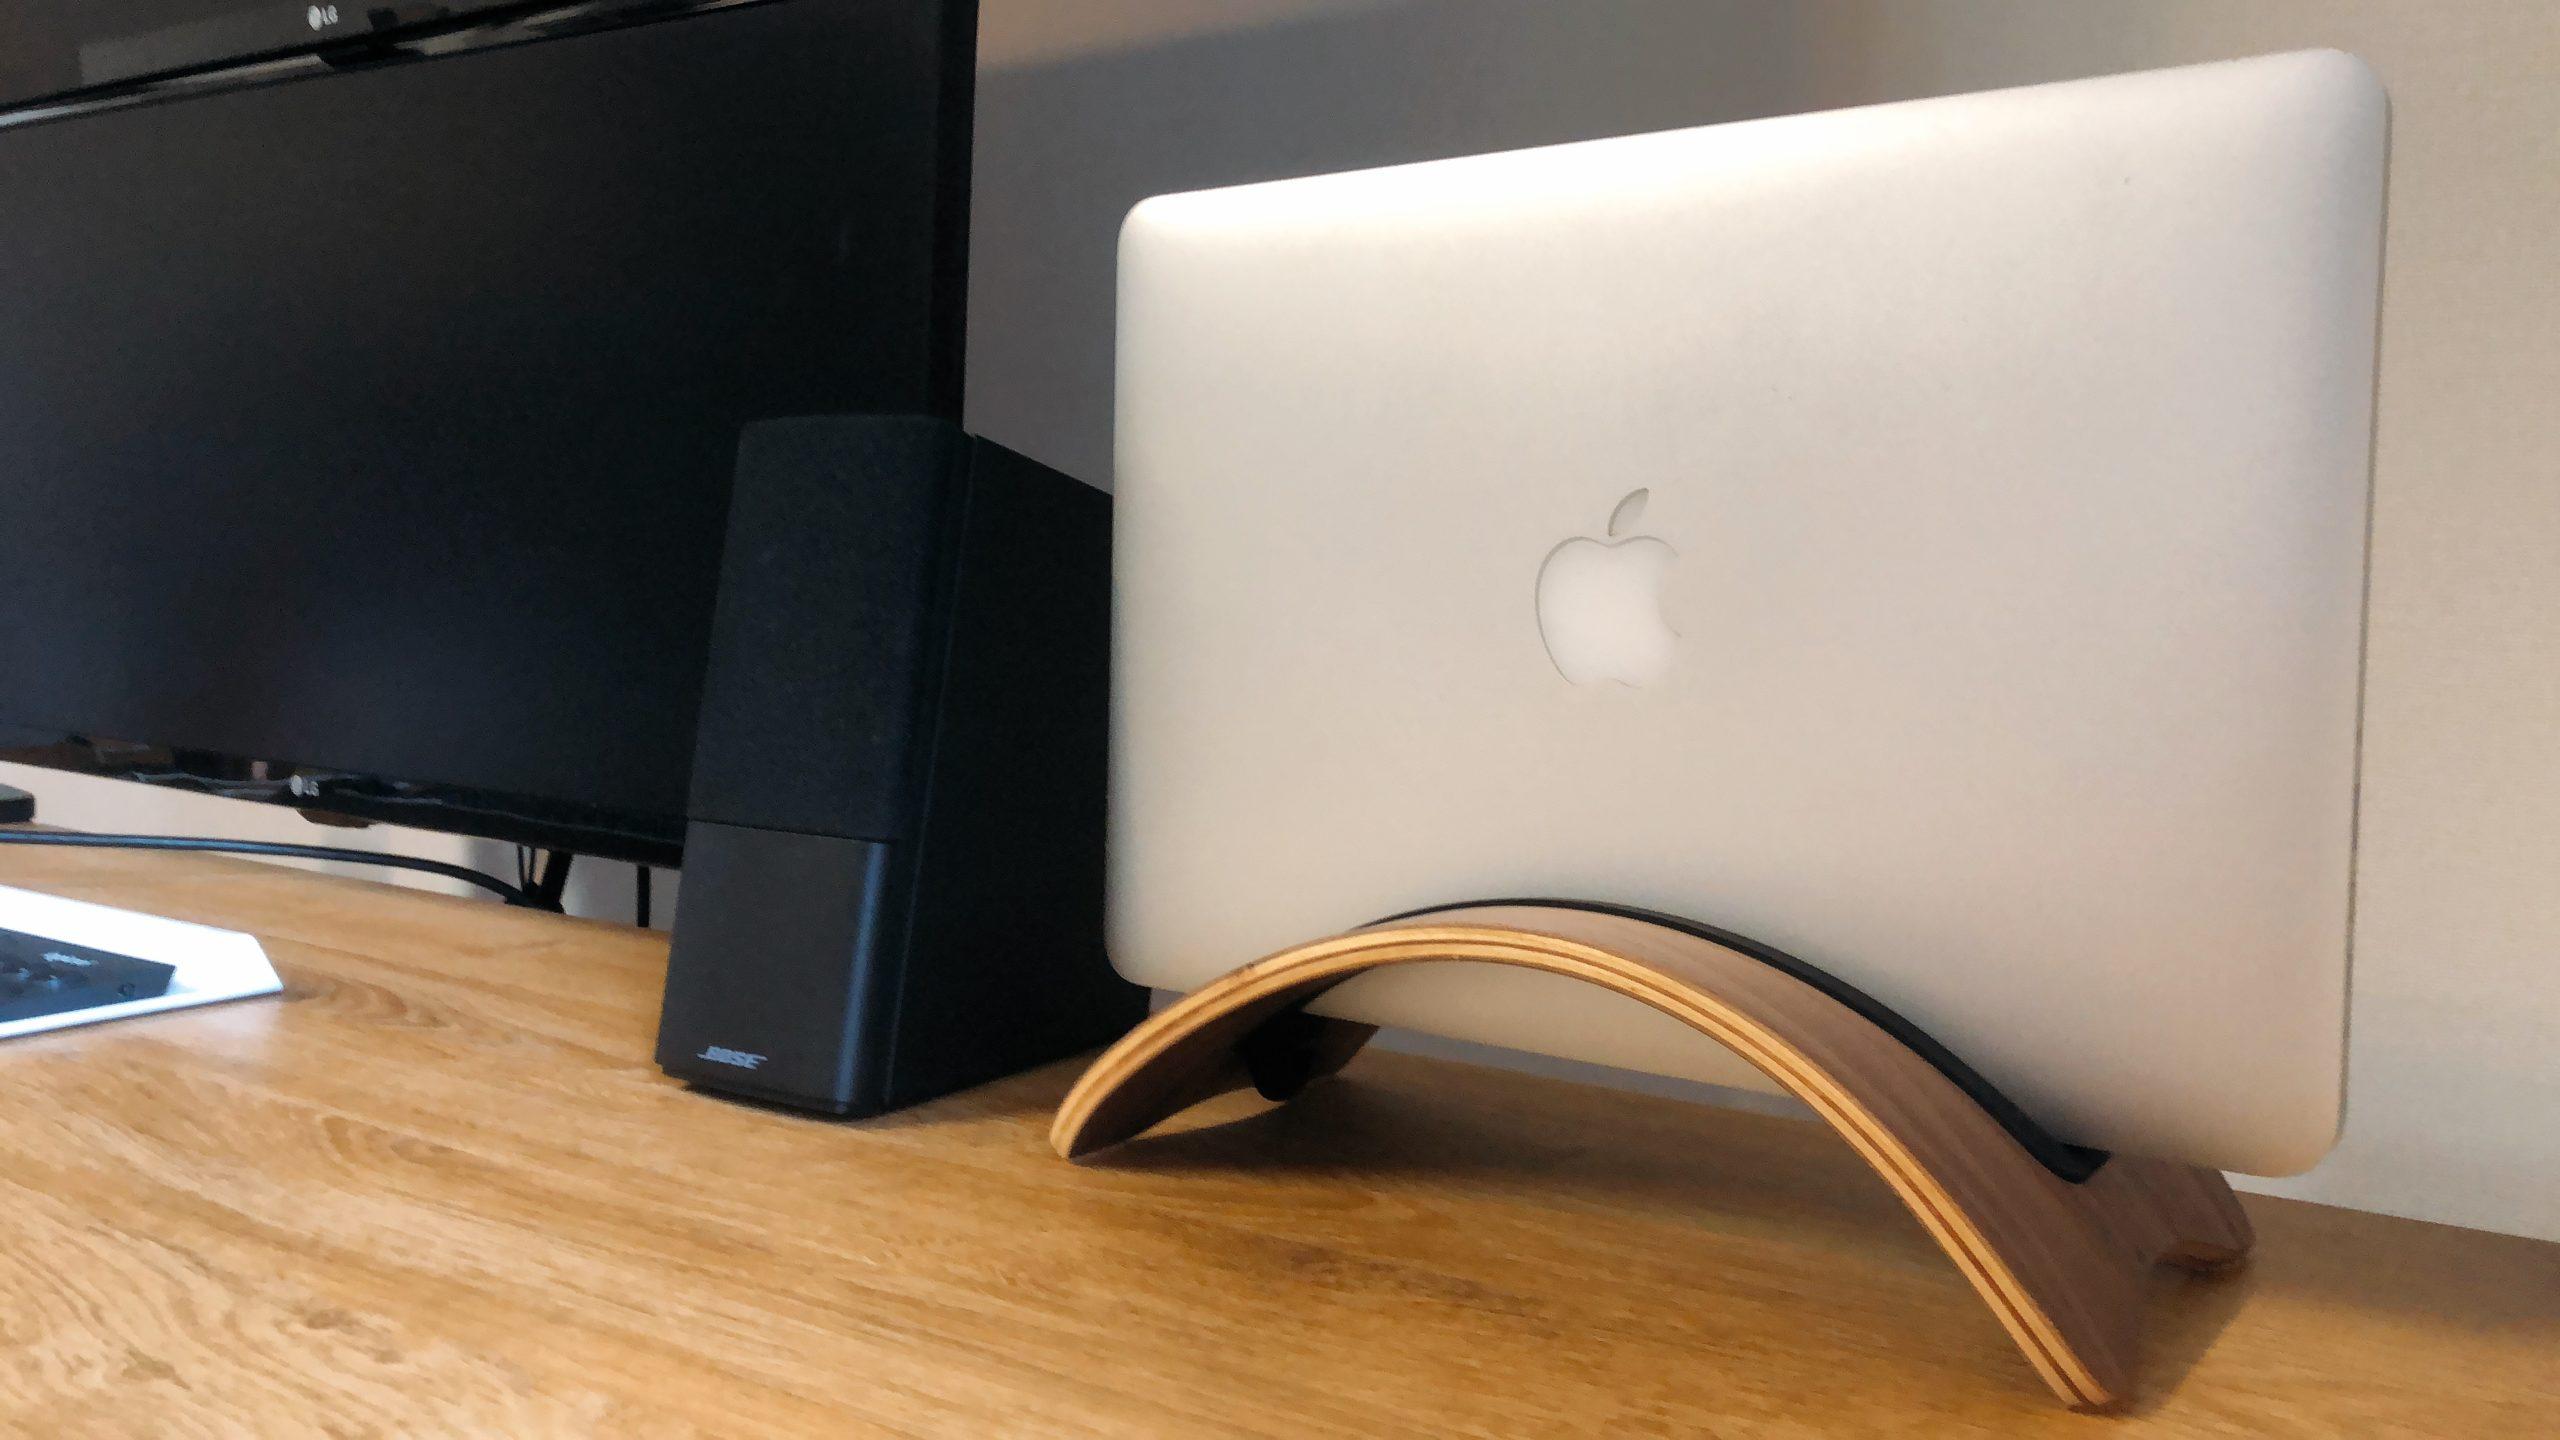 MacBookをインテリアにする